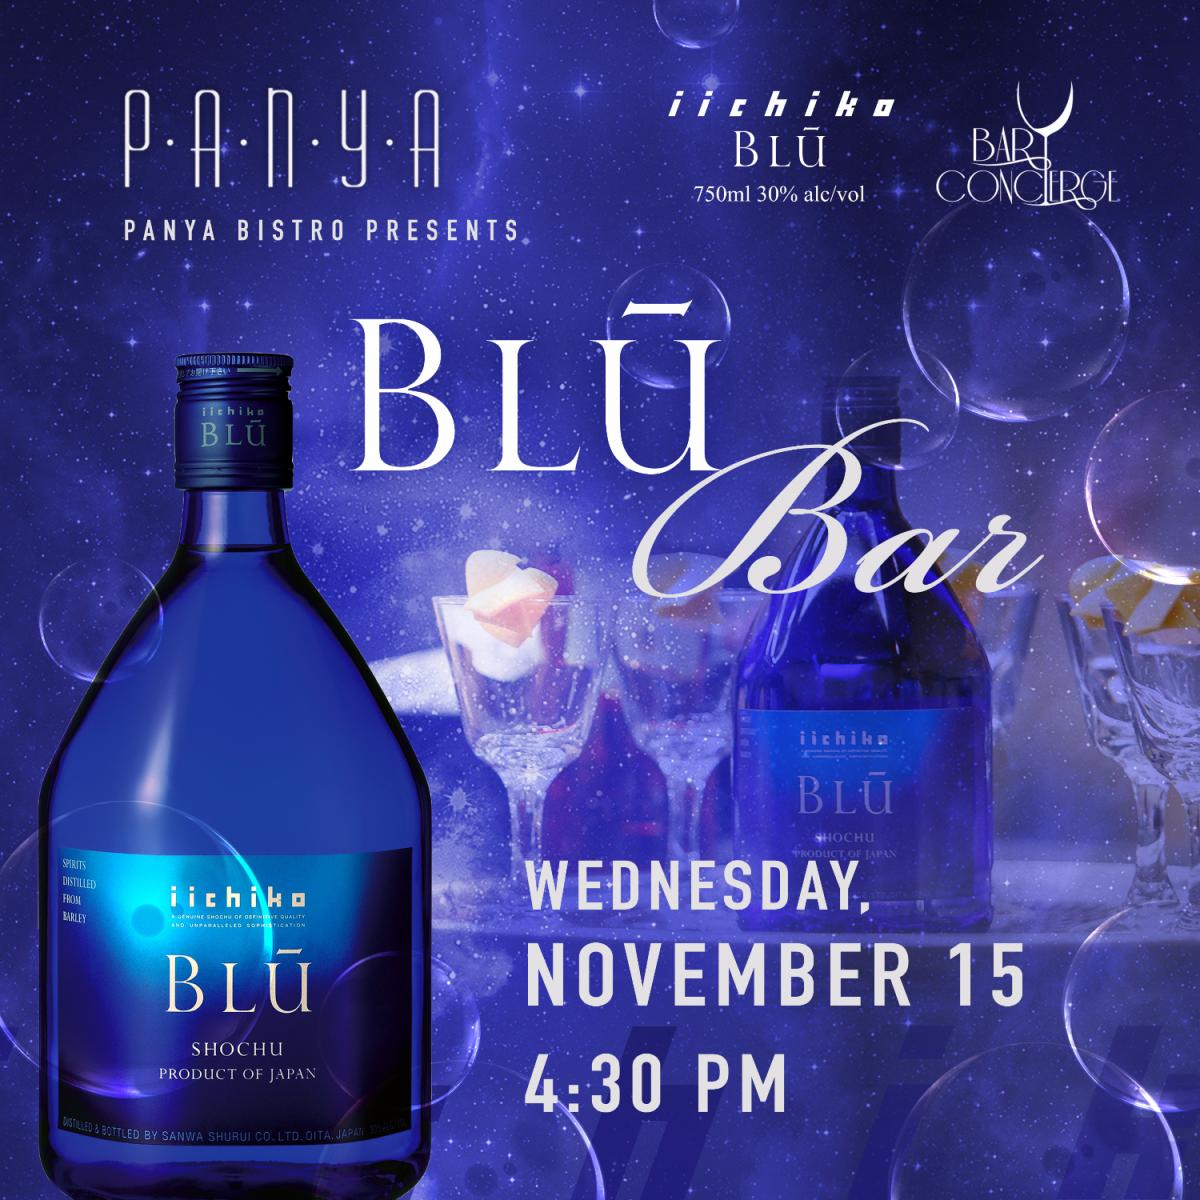 BLU Bar by iichiko BLU at Panya Bistro